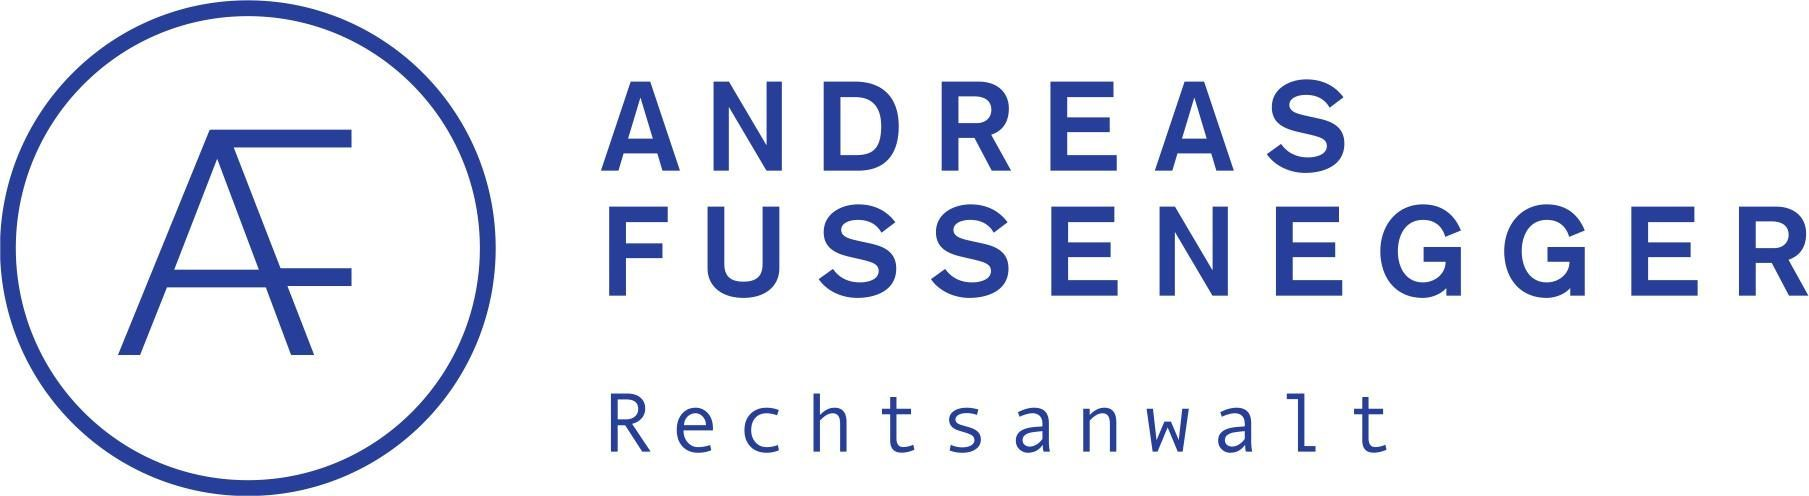 cropped-cropped-Dr.-Andreas-Fussenegger-Logo-Vorarlberg.jpg